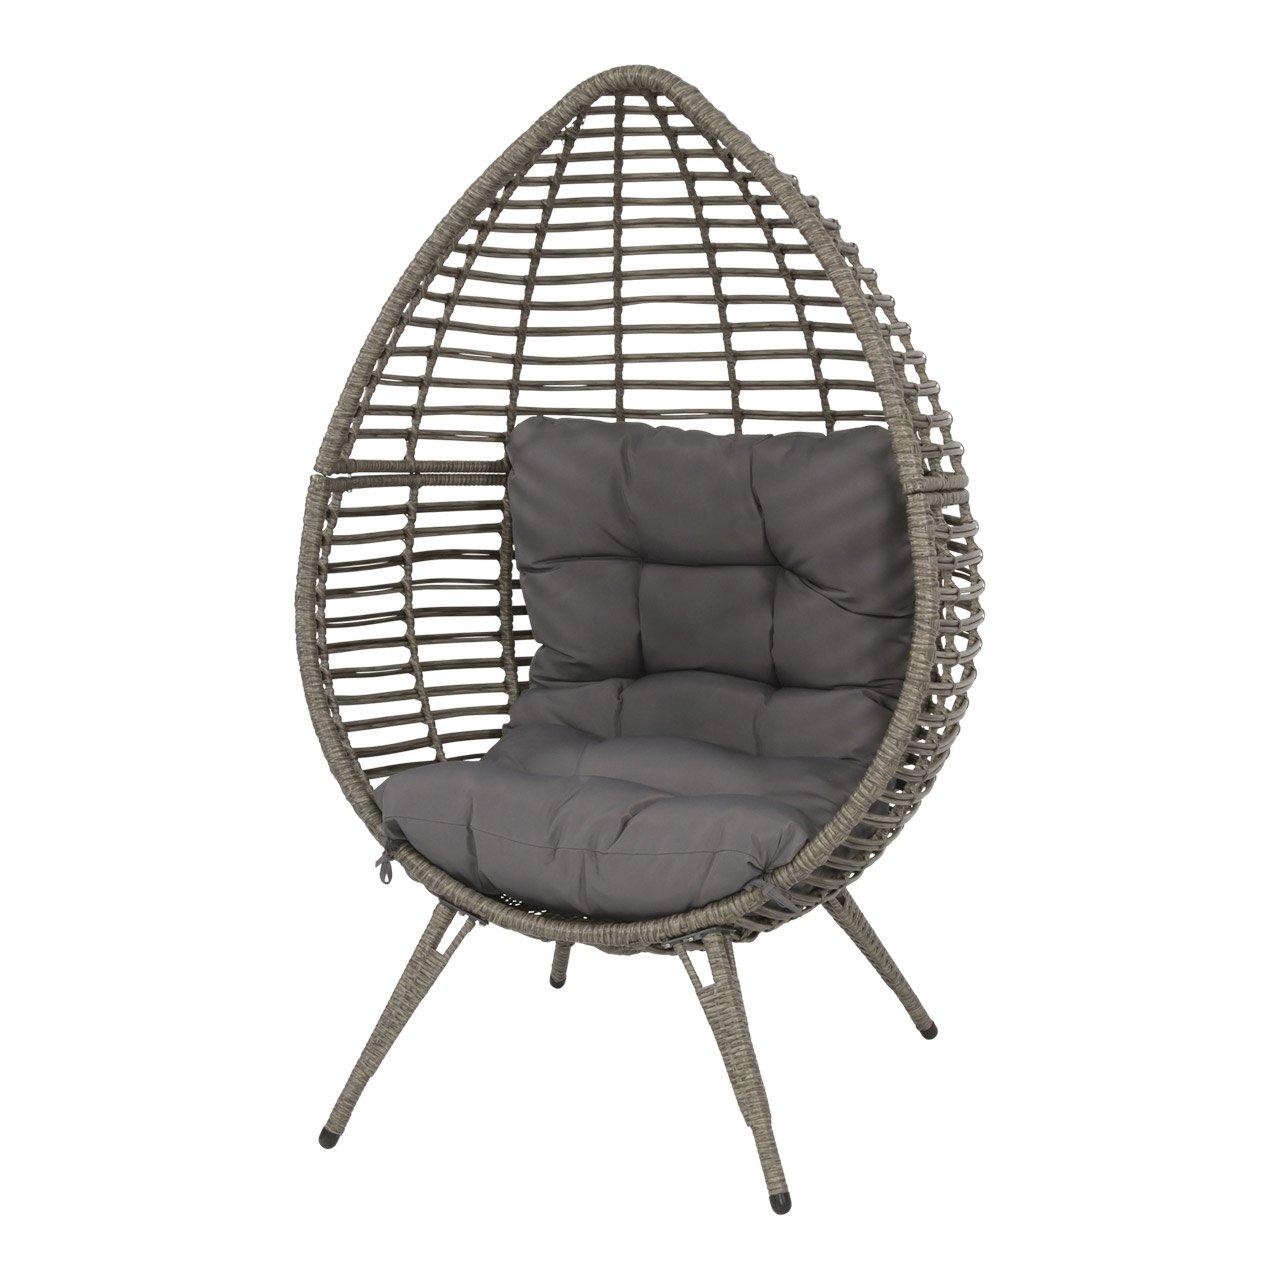 lifestyle4living Gartensessel aus Polyrattan Geflecht grau. Wetterfester Rattansessel inkl. Sitzkissen, ideal als Garten, Balkon-Sessel und Terrassensessel.